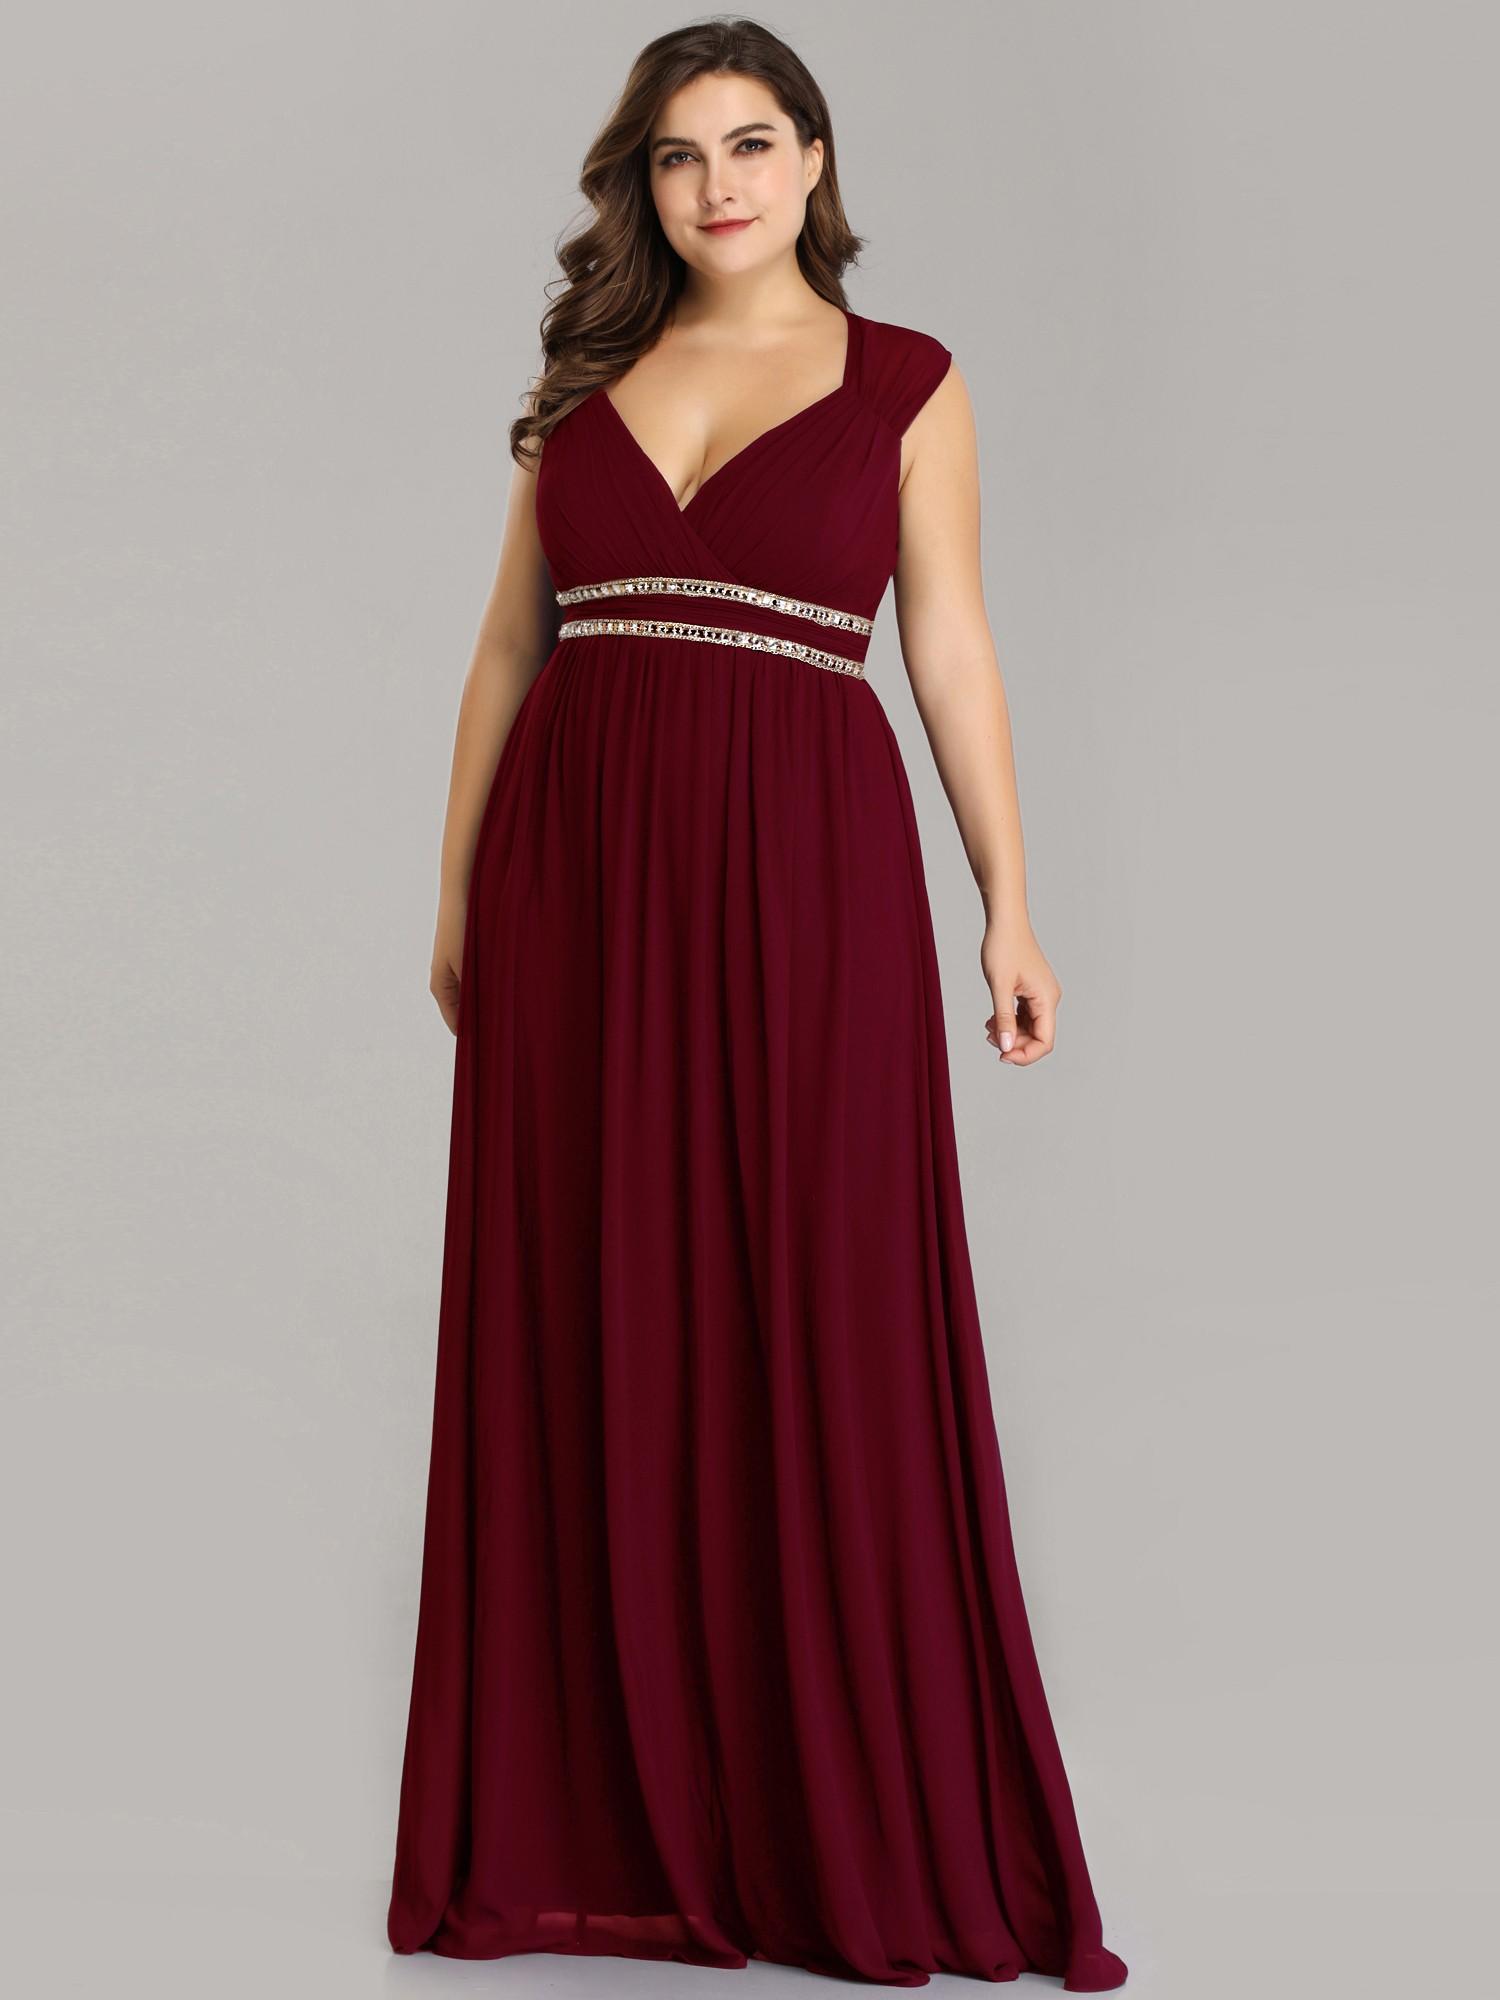 Burgundy Long V Neck Plus Size Mother Of The Bride Dresses